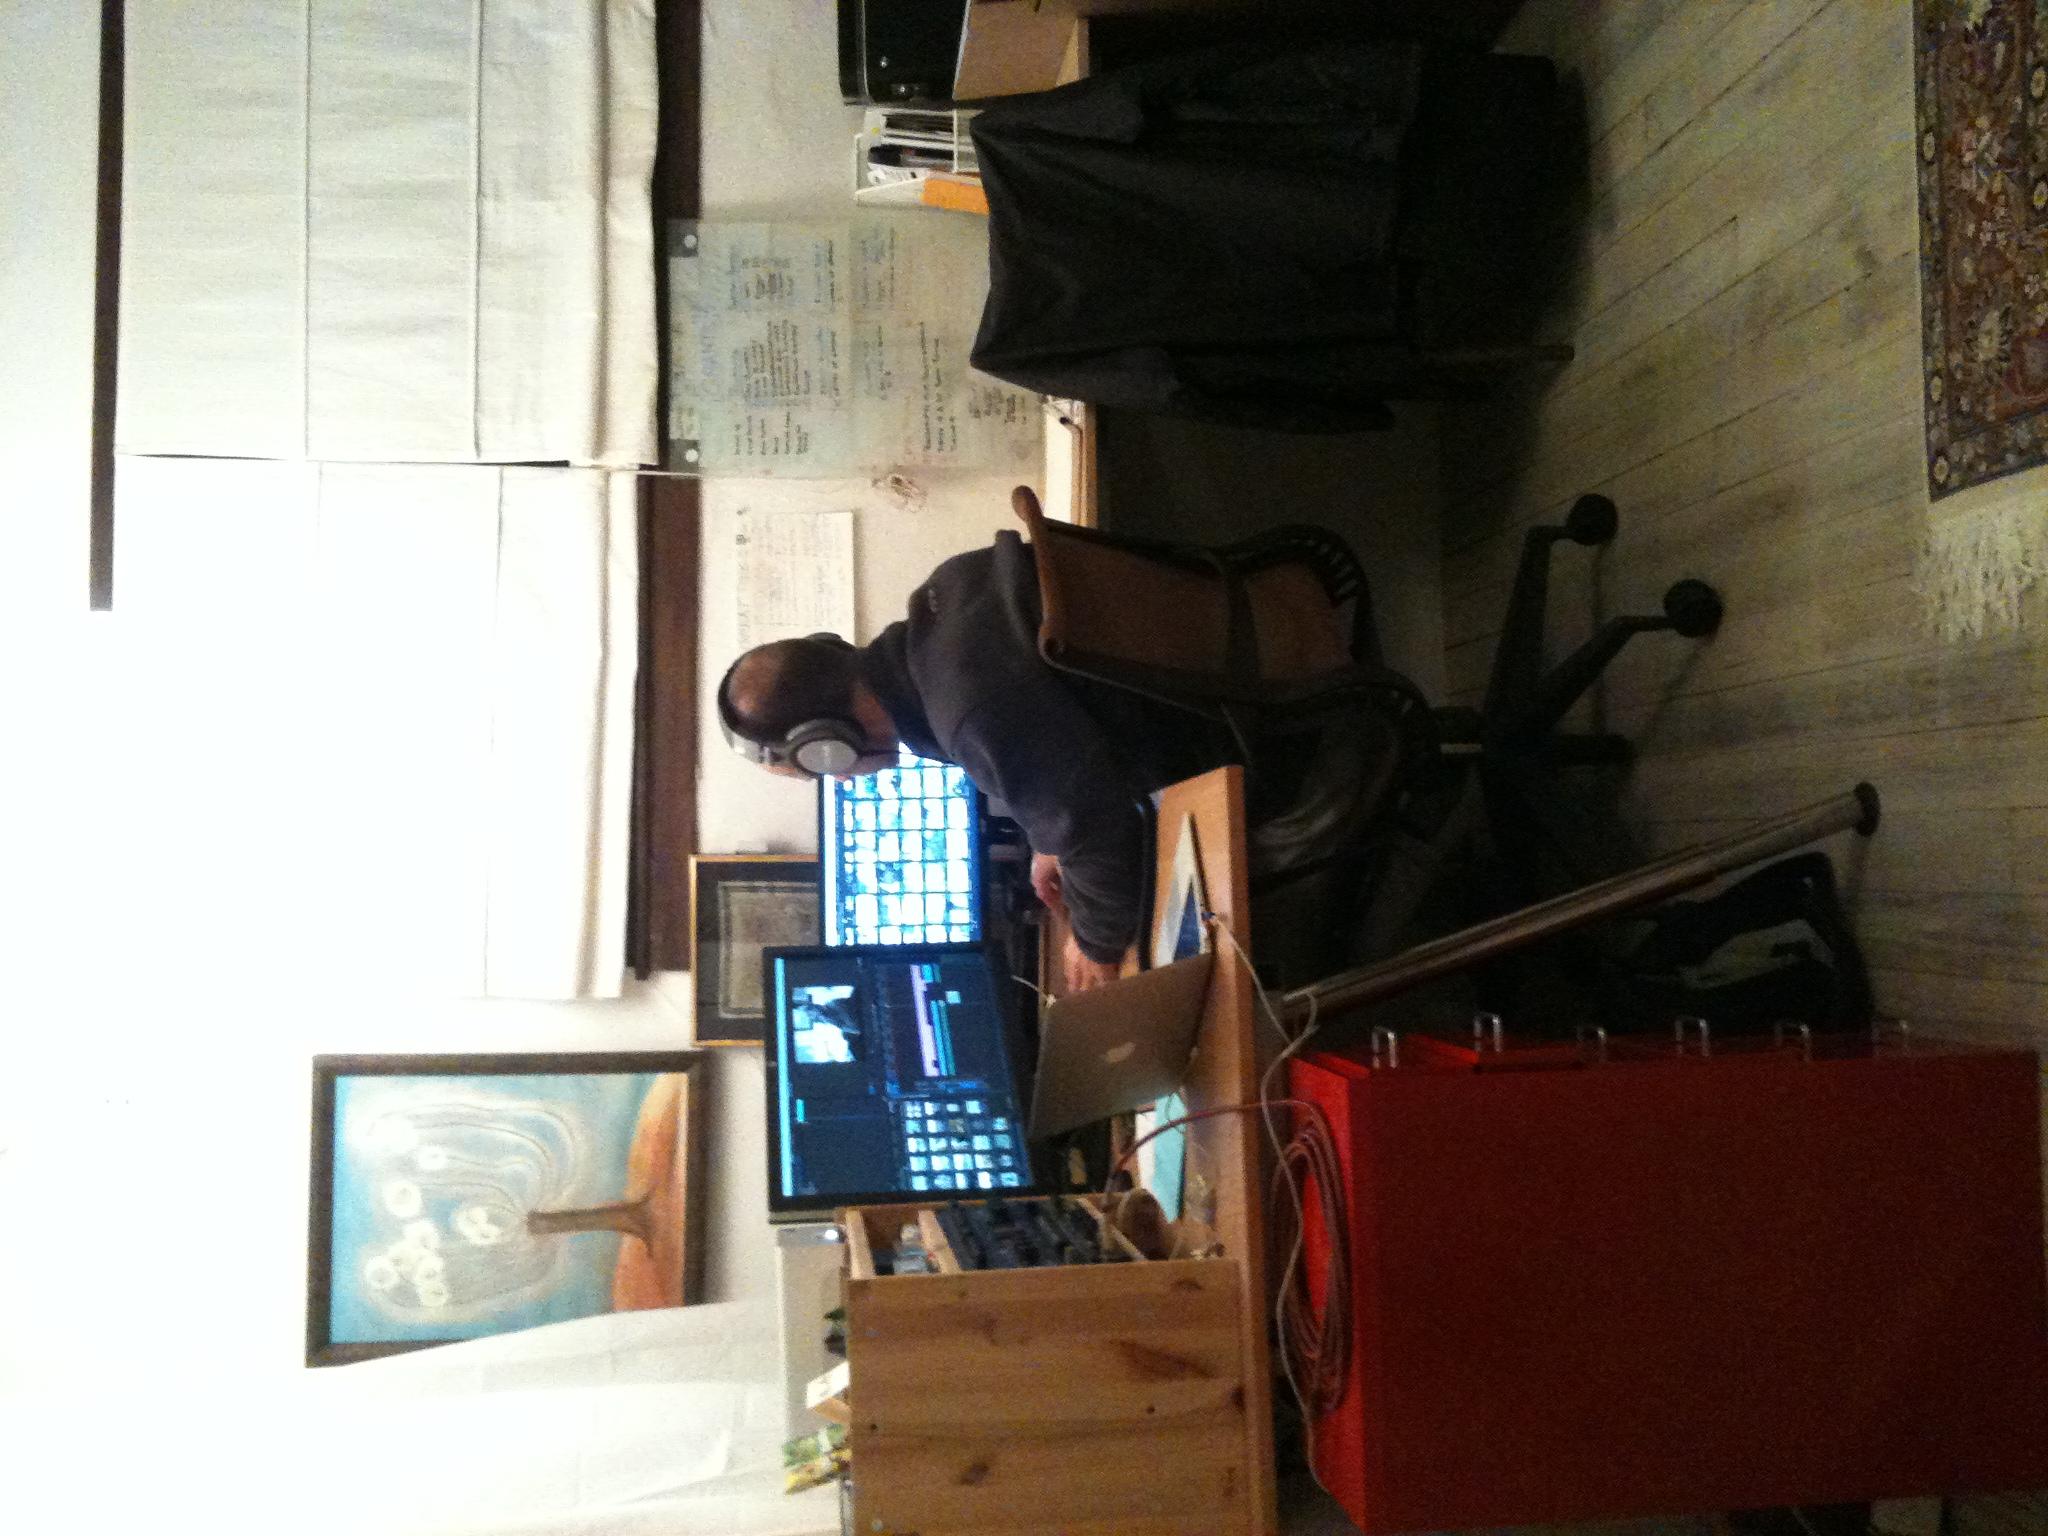 Tom MIller, Editing at home